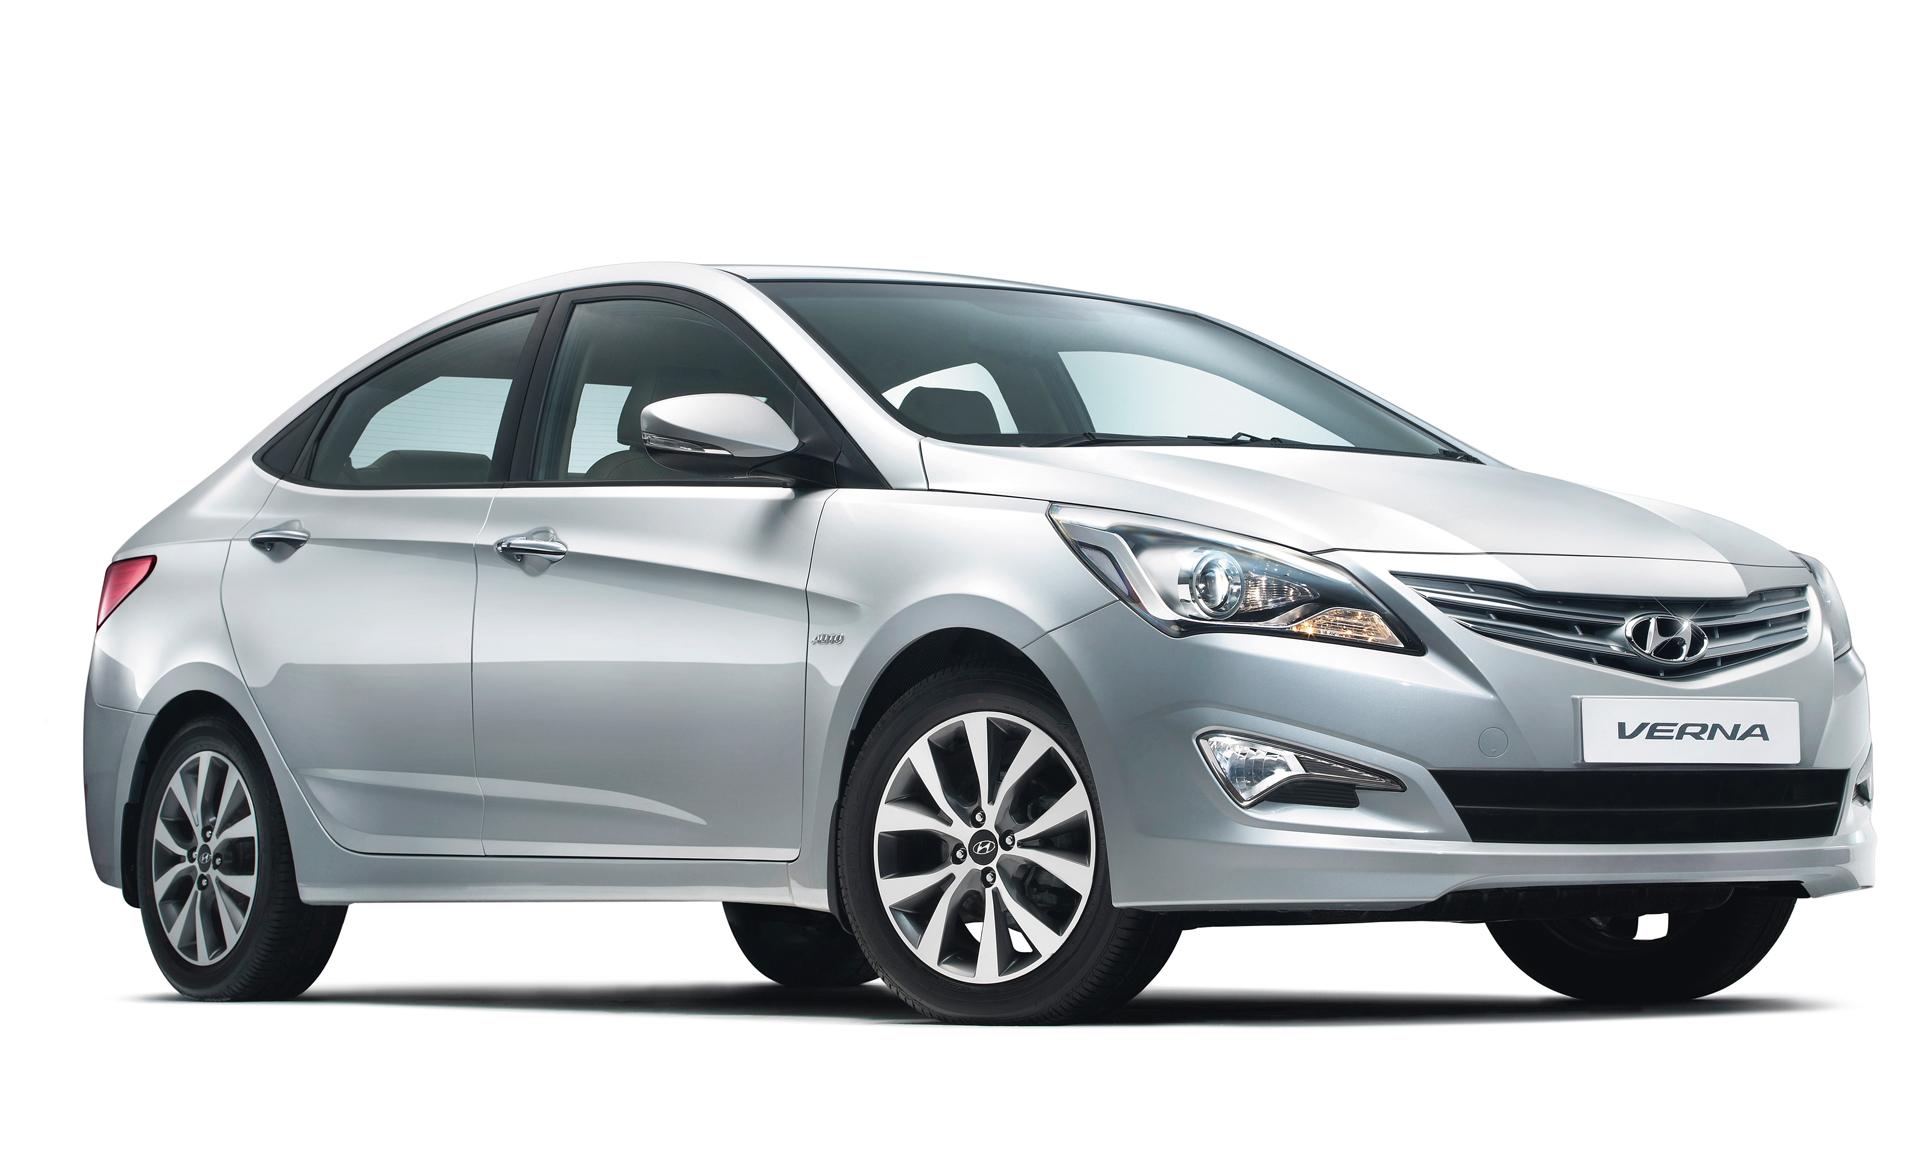 2015-hyundai-verna-facelift-front